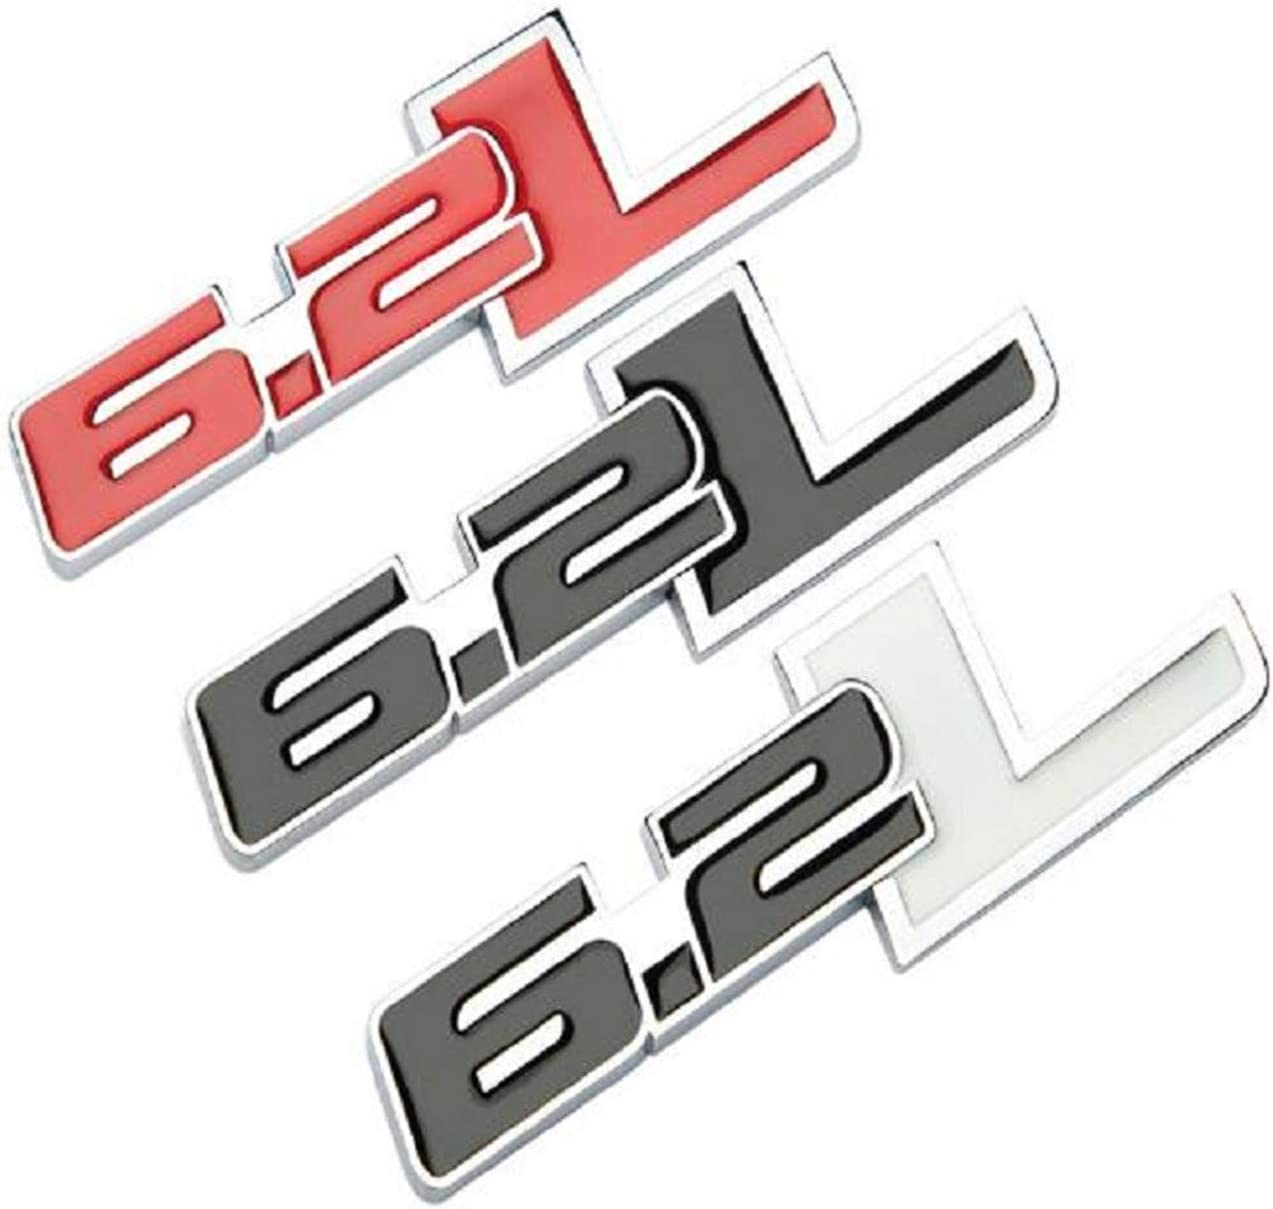 chisushangm 6.2L Metal Tailgate Boot Badge Emblem F150 Raptor Chevy GMC